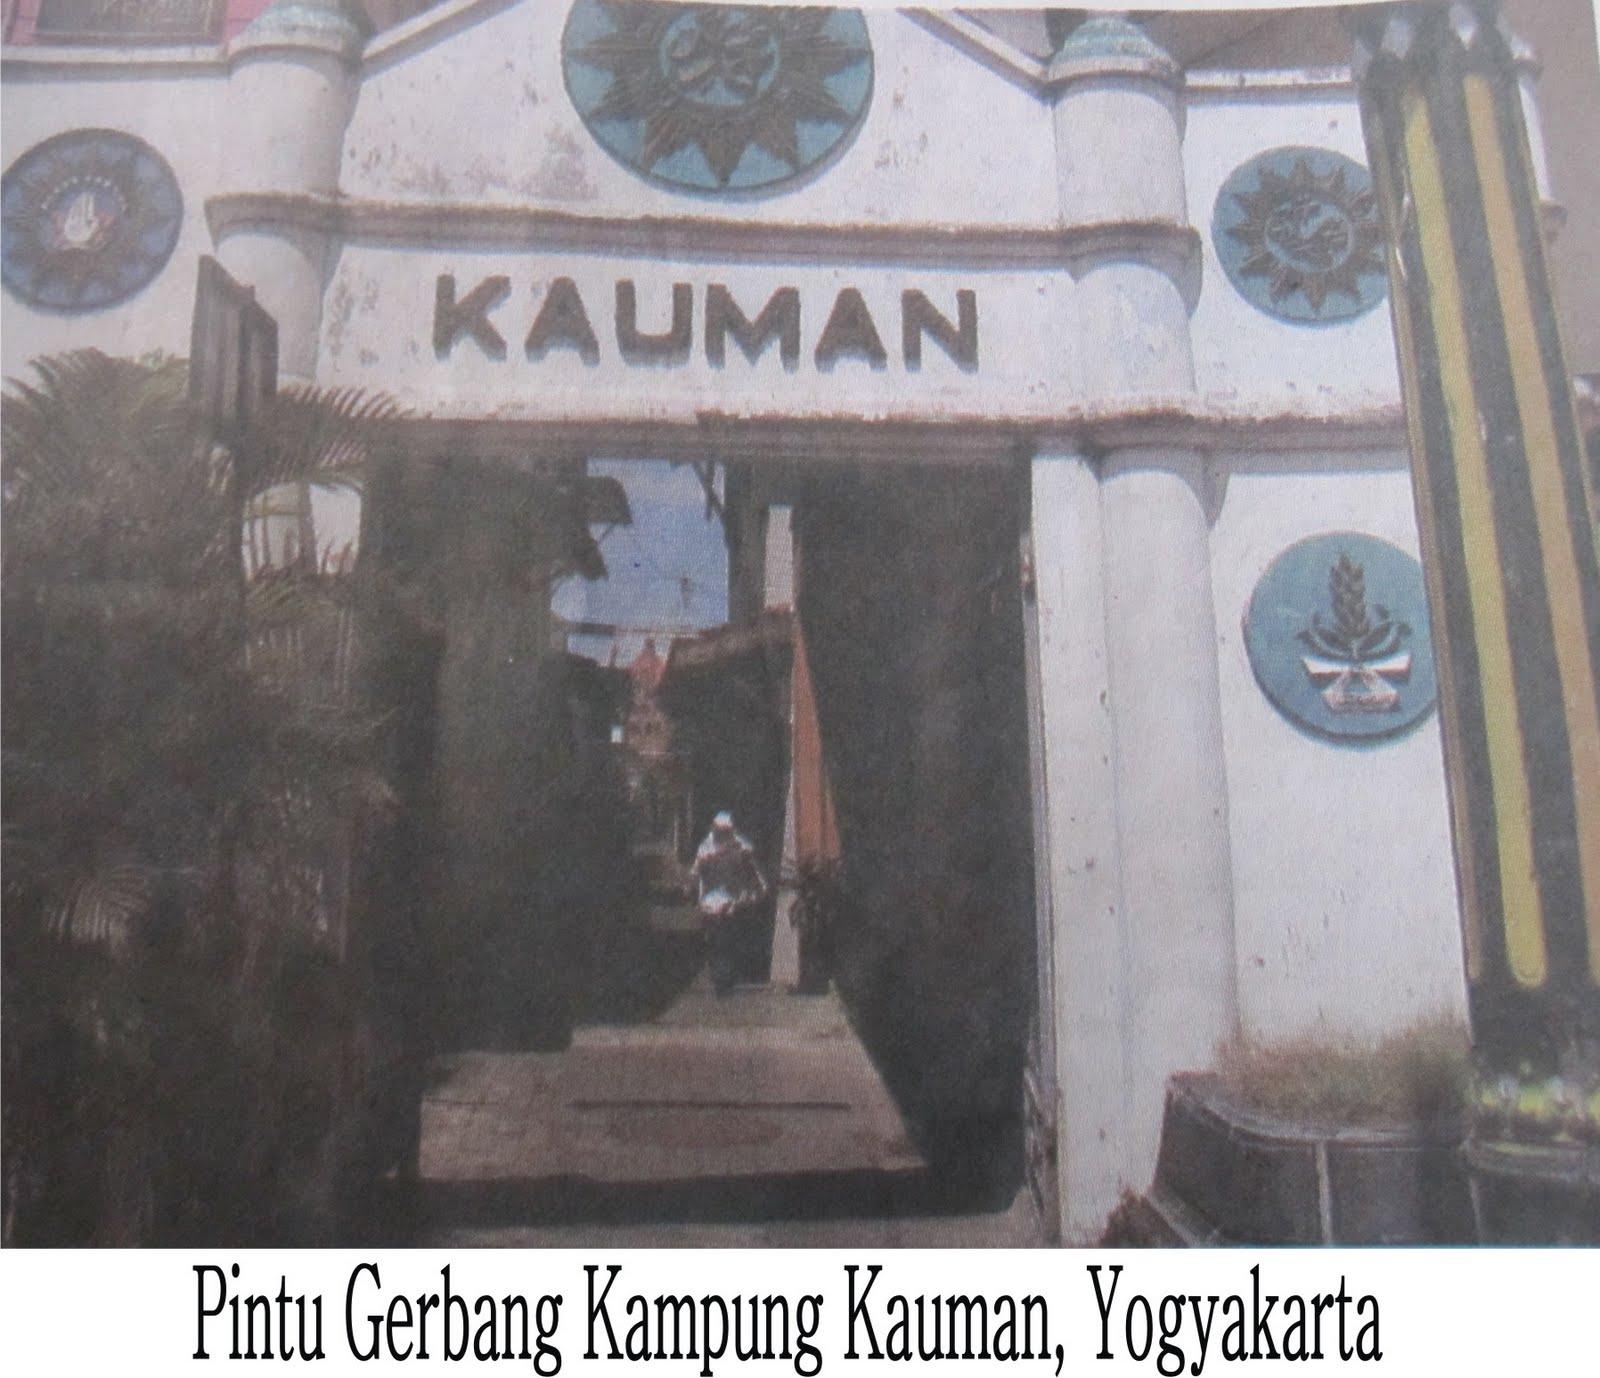 Sejarah Batik Kampung Kauman Ikon Industri Wisata Kota Foto Diambil